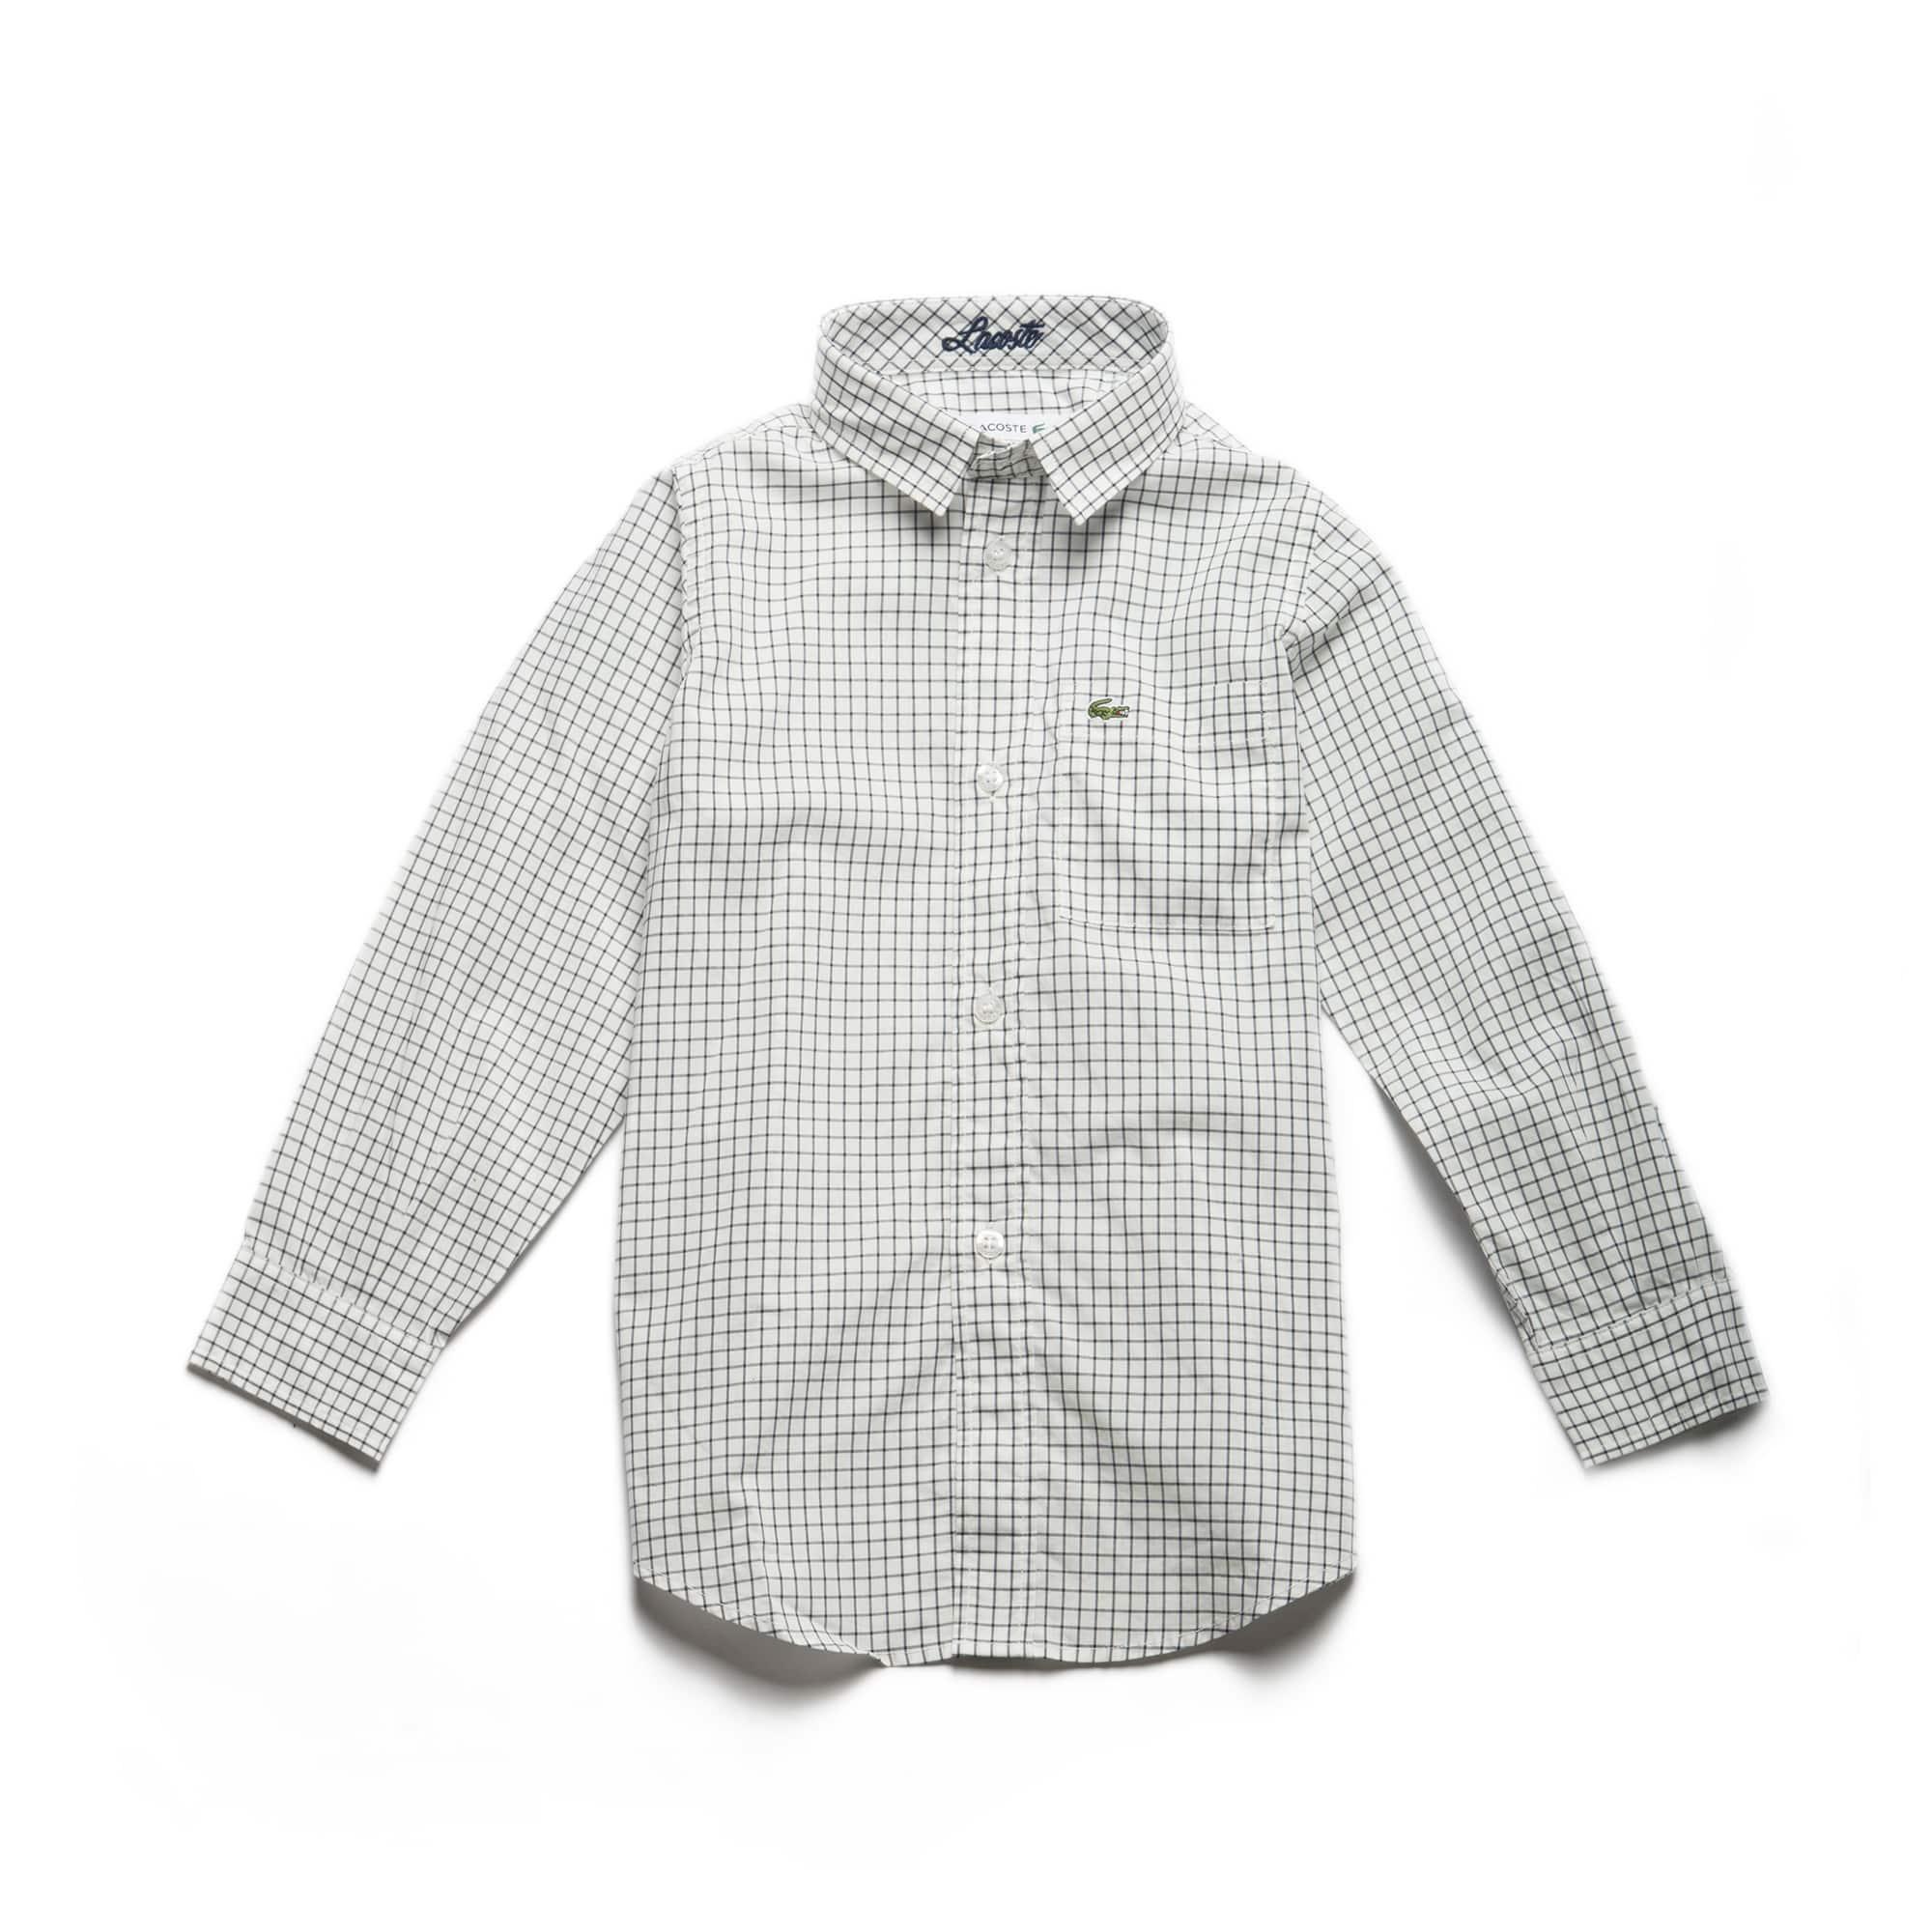 Boys' Check Cotton Poplin Shirt